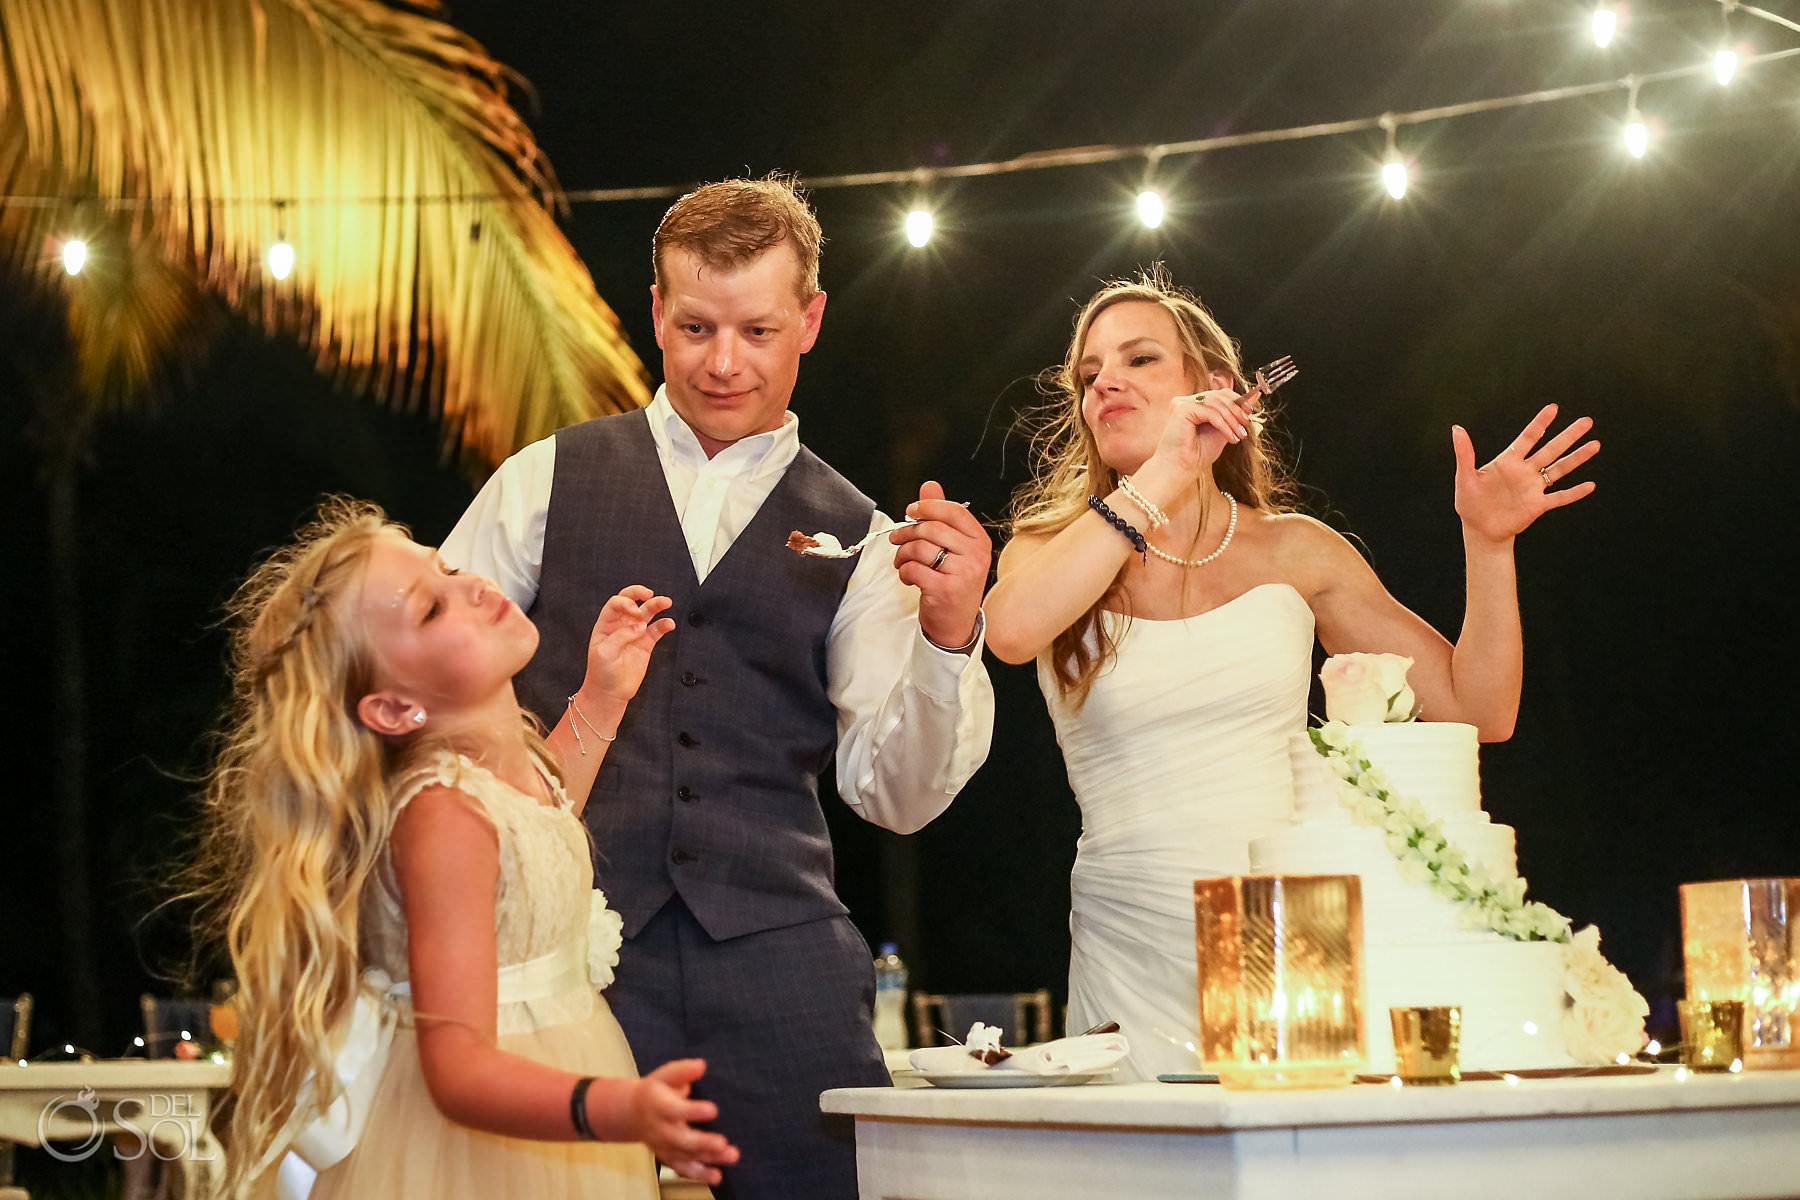 cake cutting family fun Wedding Captain Morgan Grill reception Riviera Maya Mexico